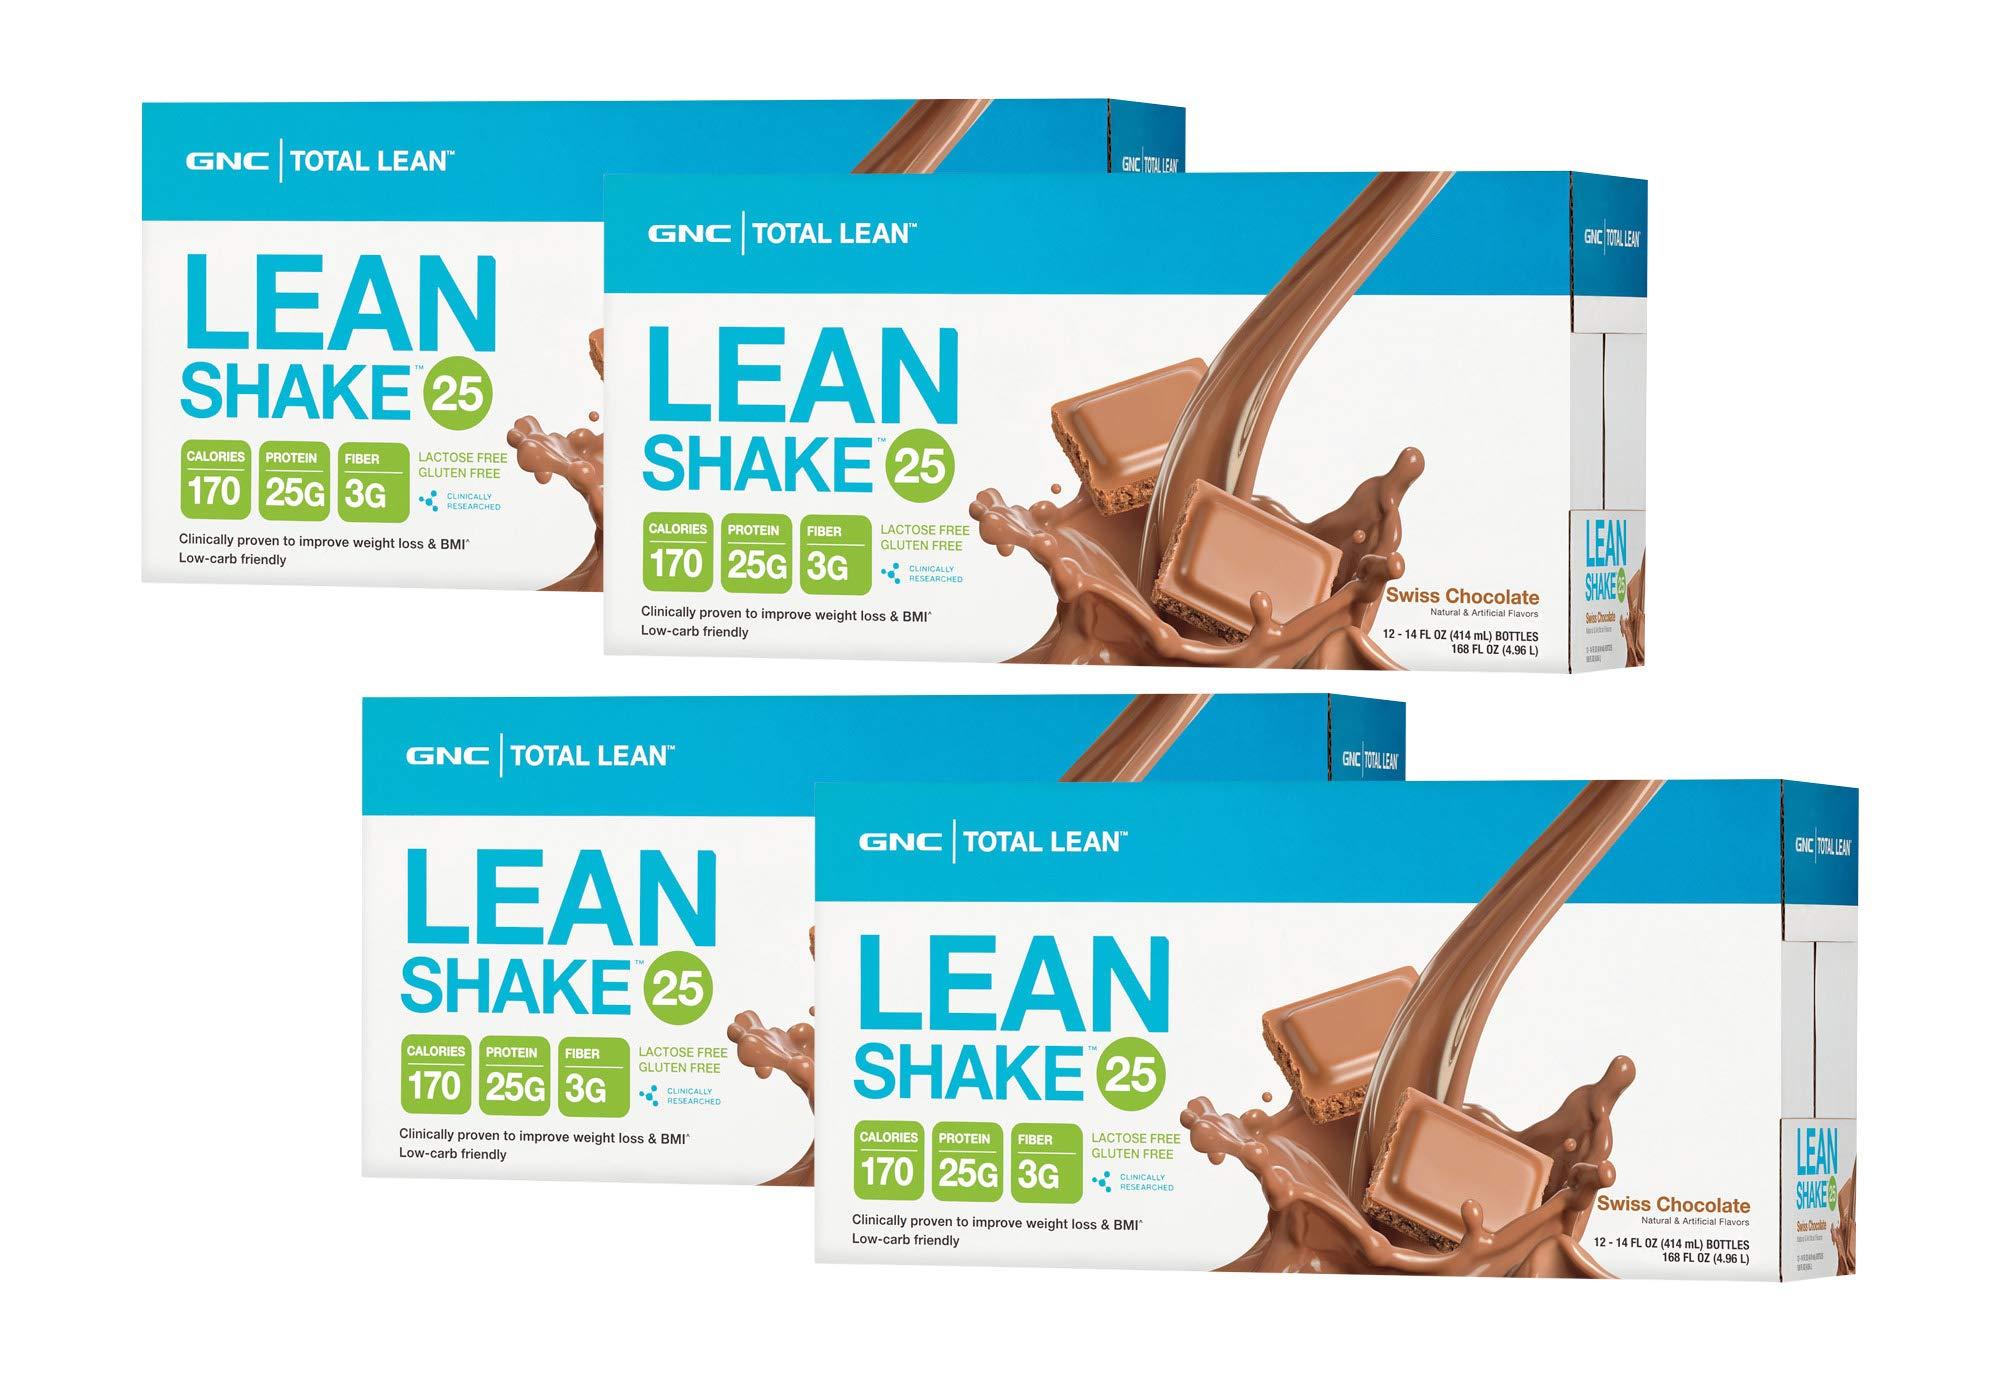 GNC Total Lean Lean Shake - Swiss Chocolate - 4 Pack